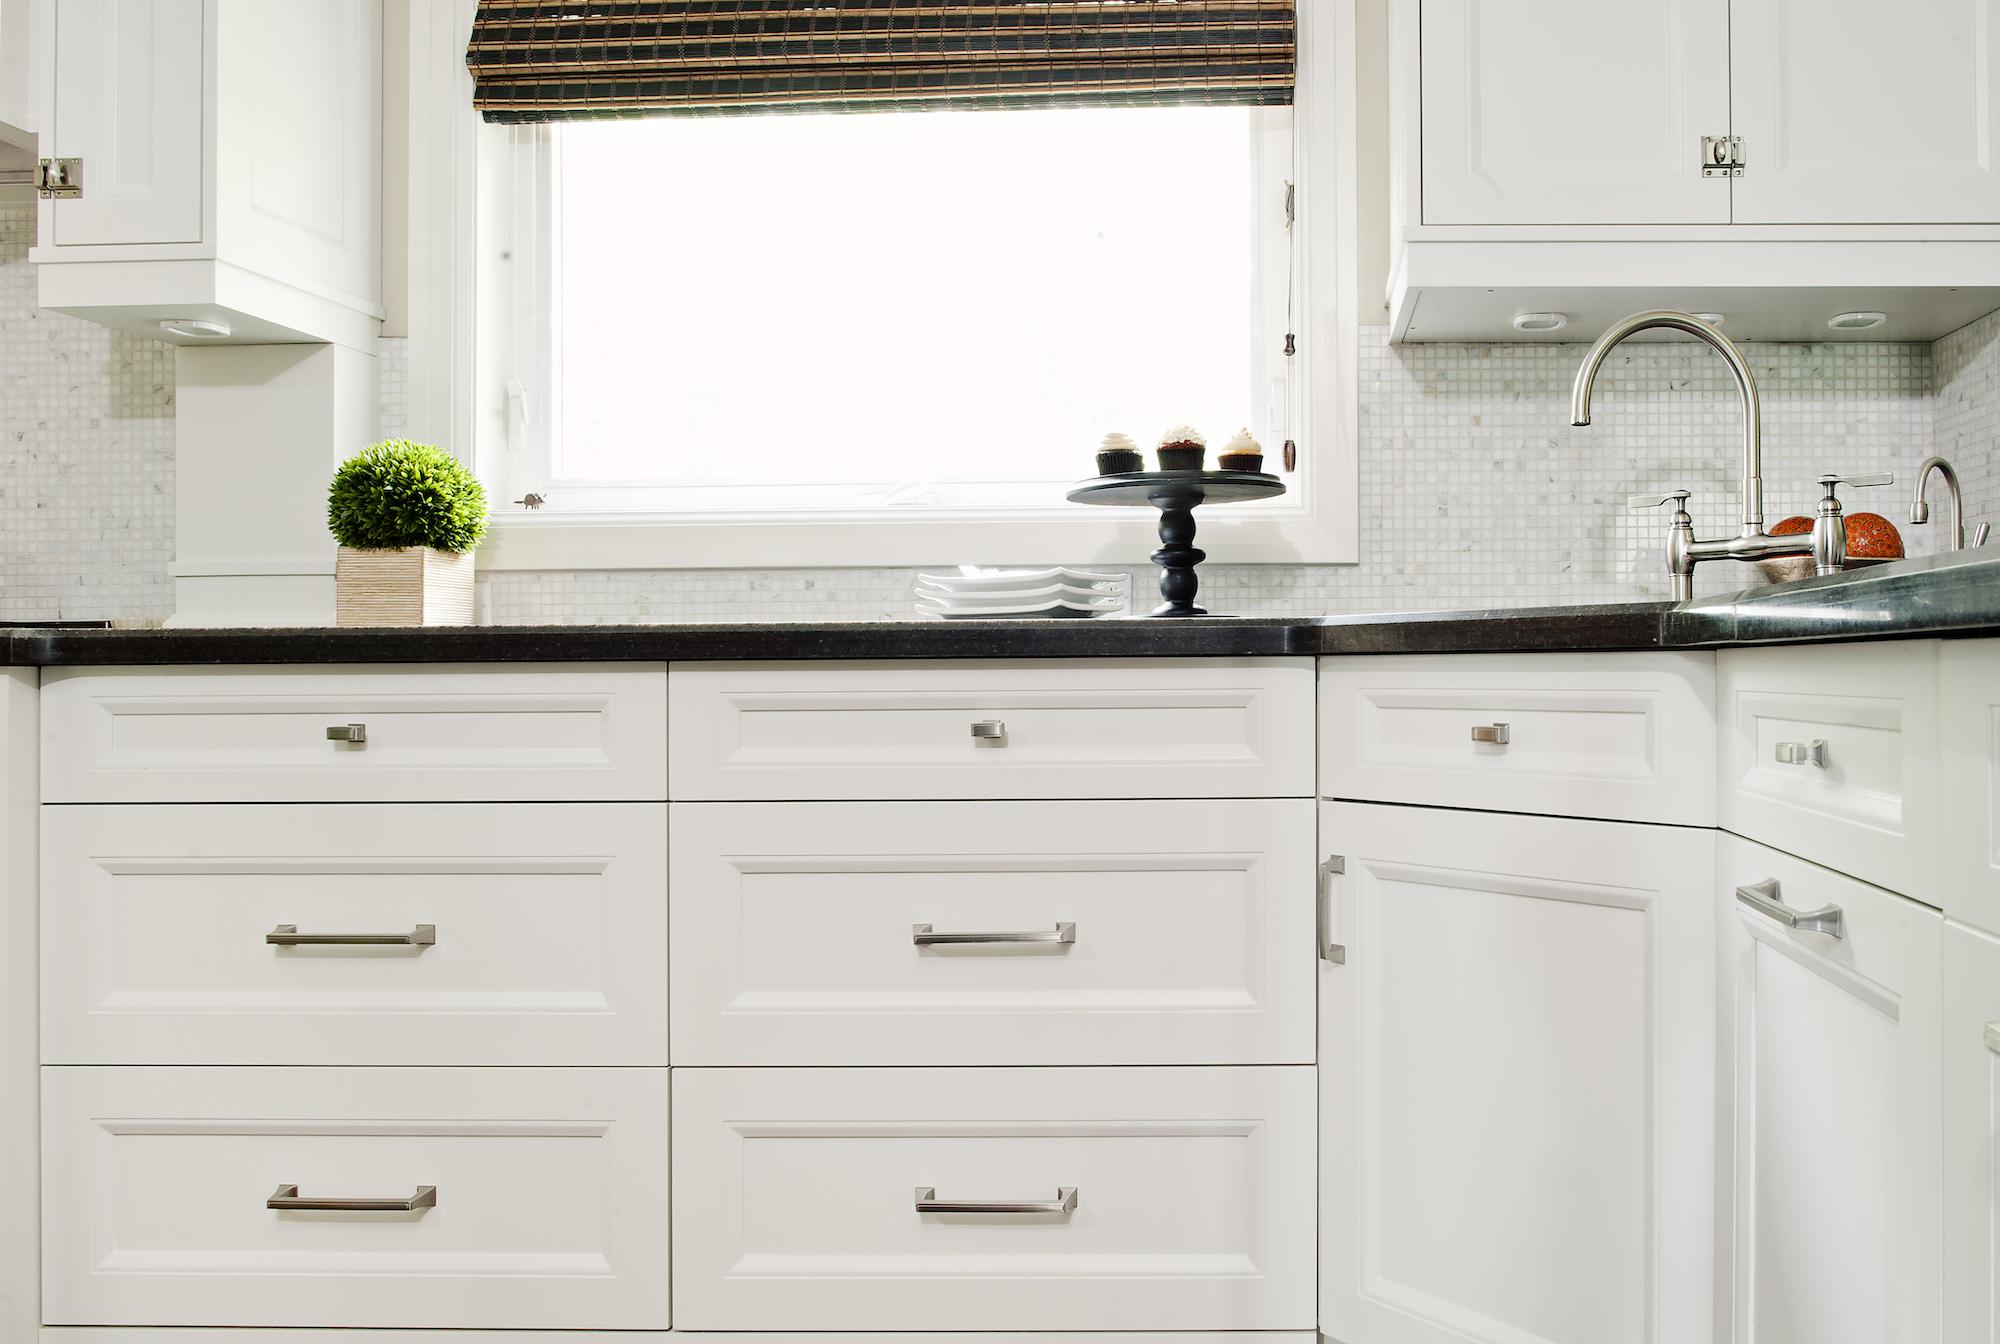 13 Pizzale Design Interior Decorating kitchen white cabinet quartz .jpg